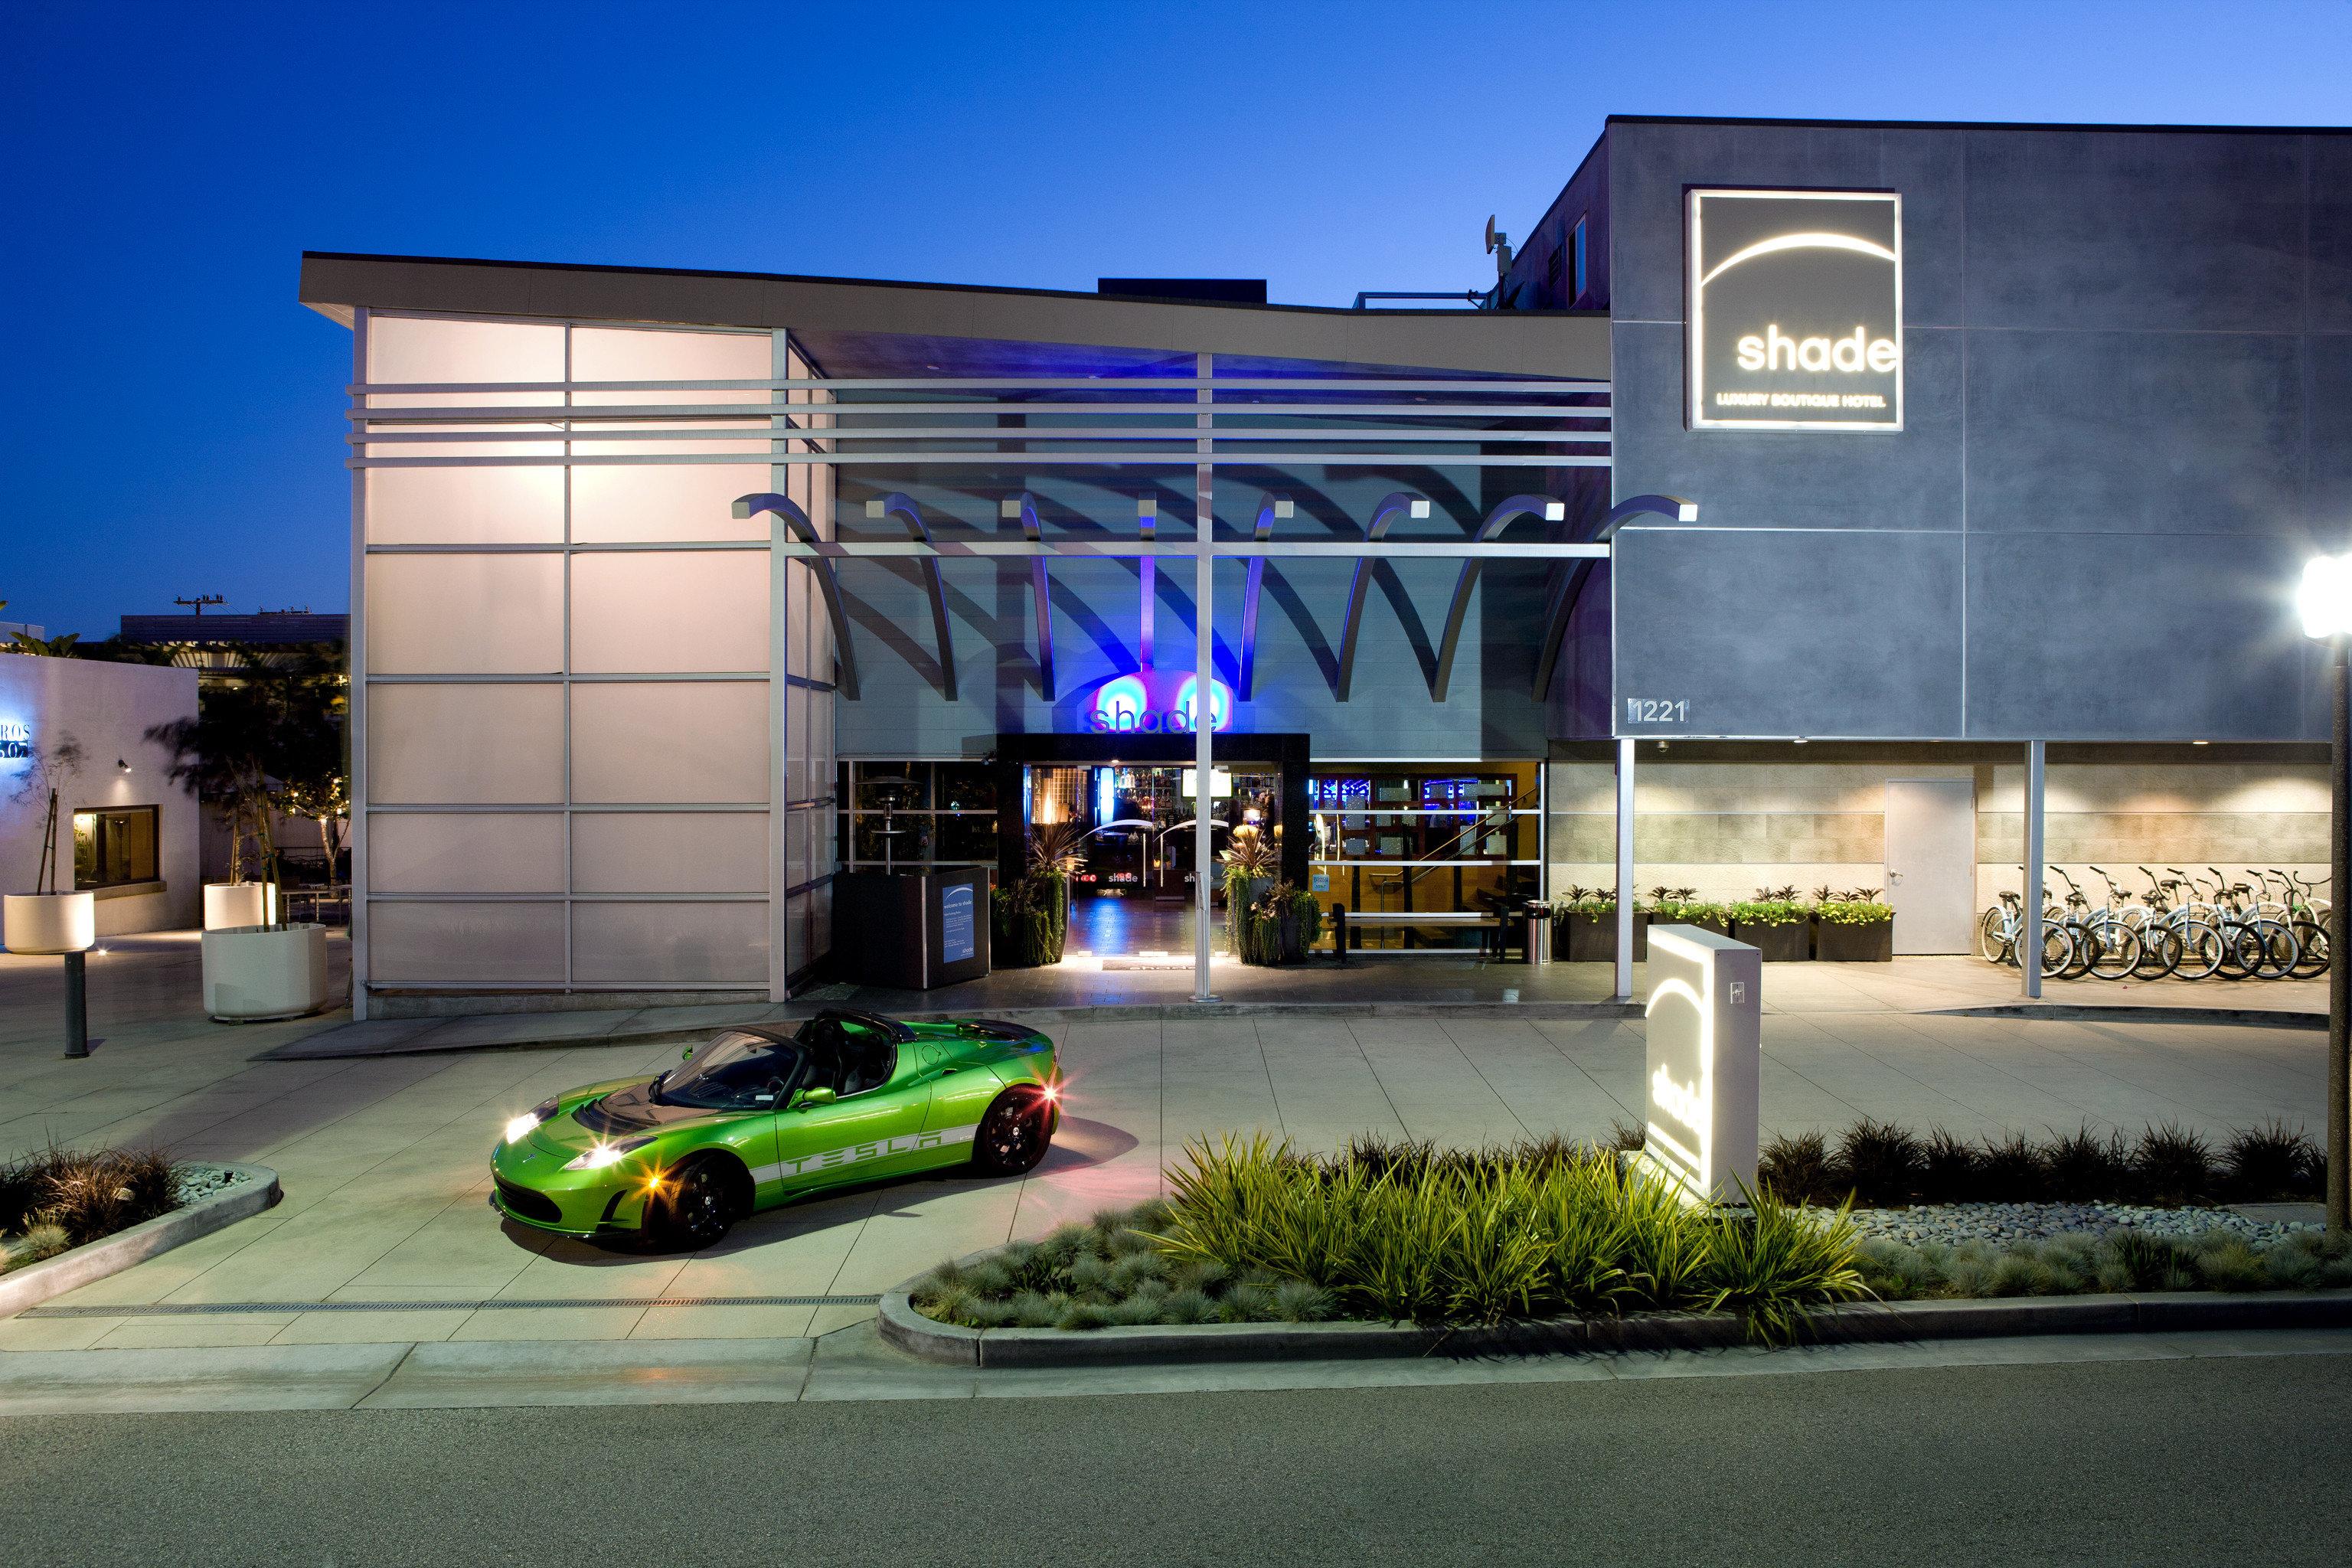 Elegant Exterior Luxury sky Architecture vehicle shopping mall sign